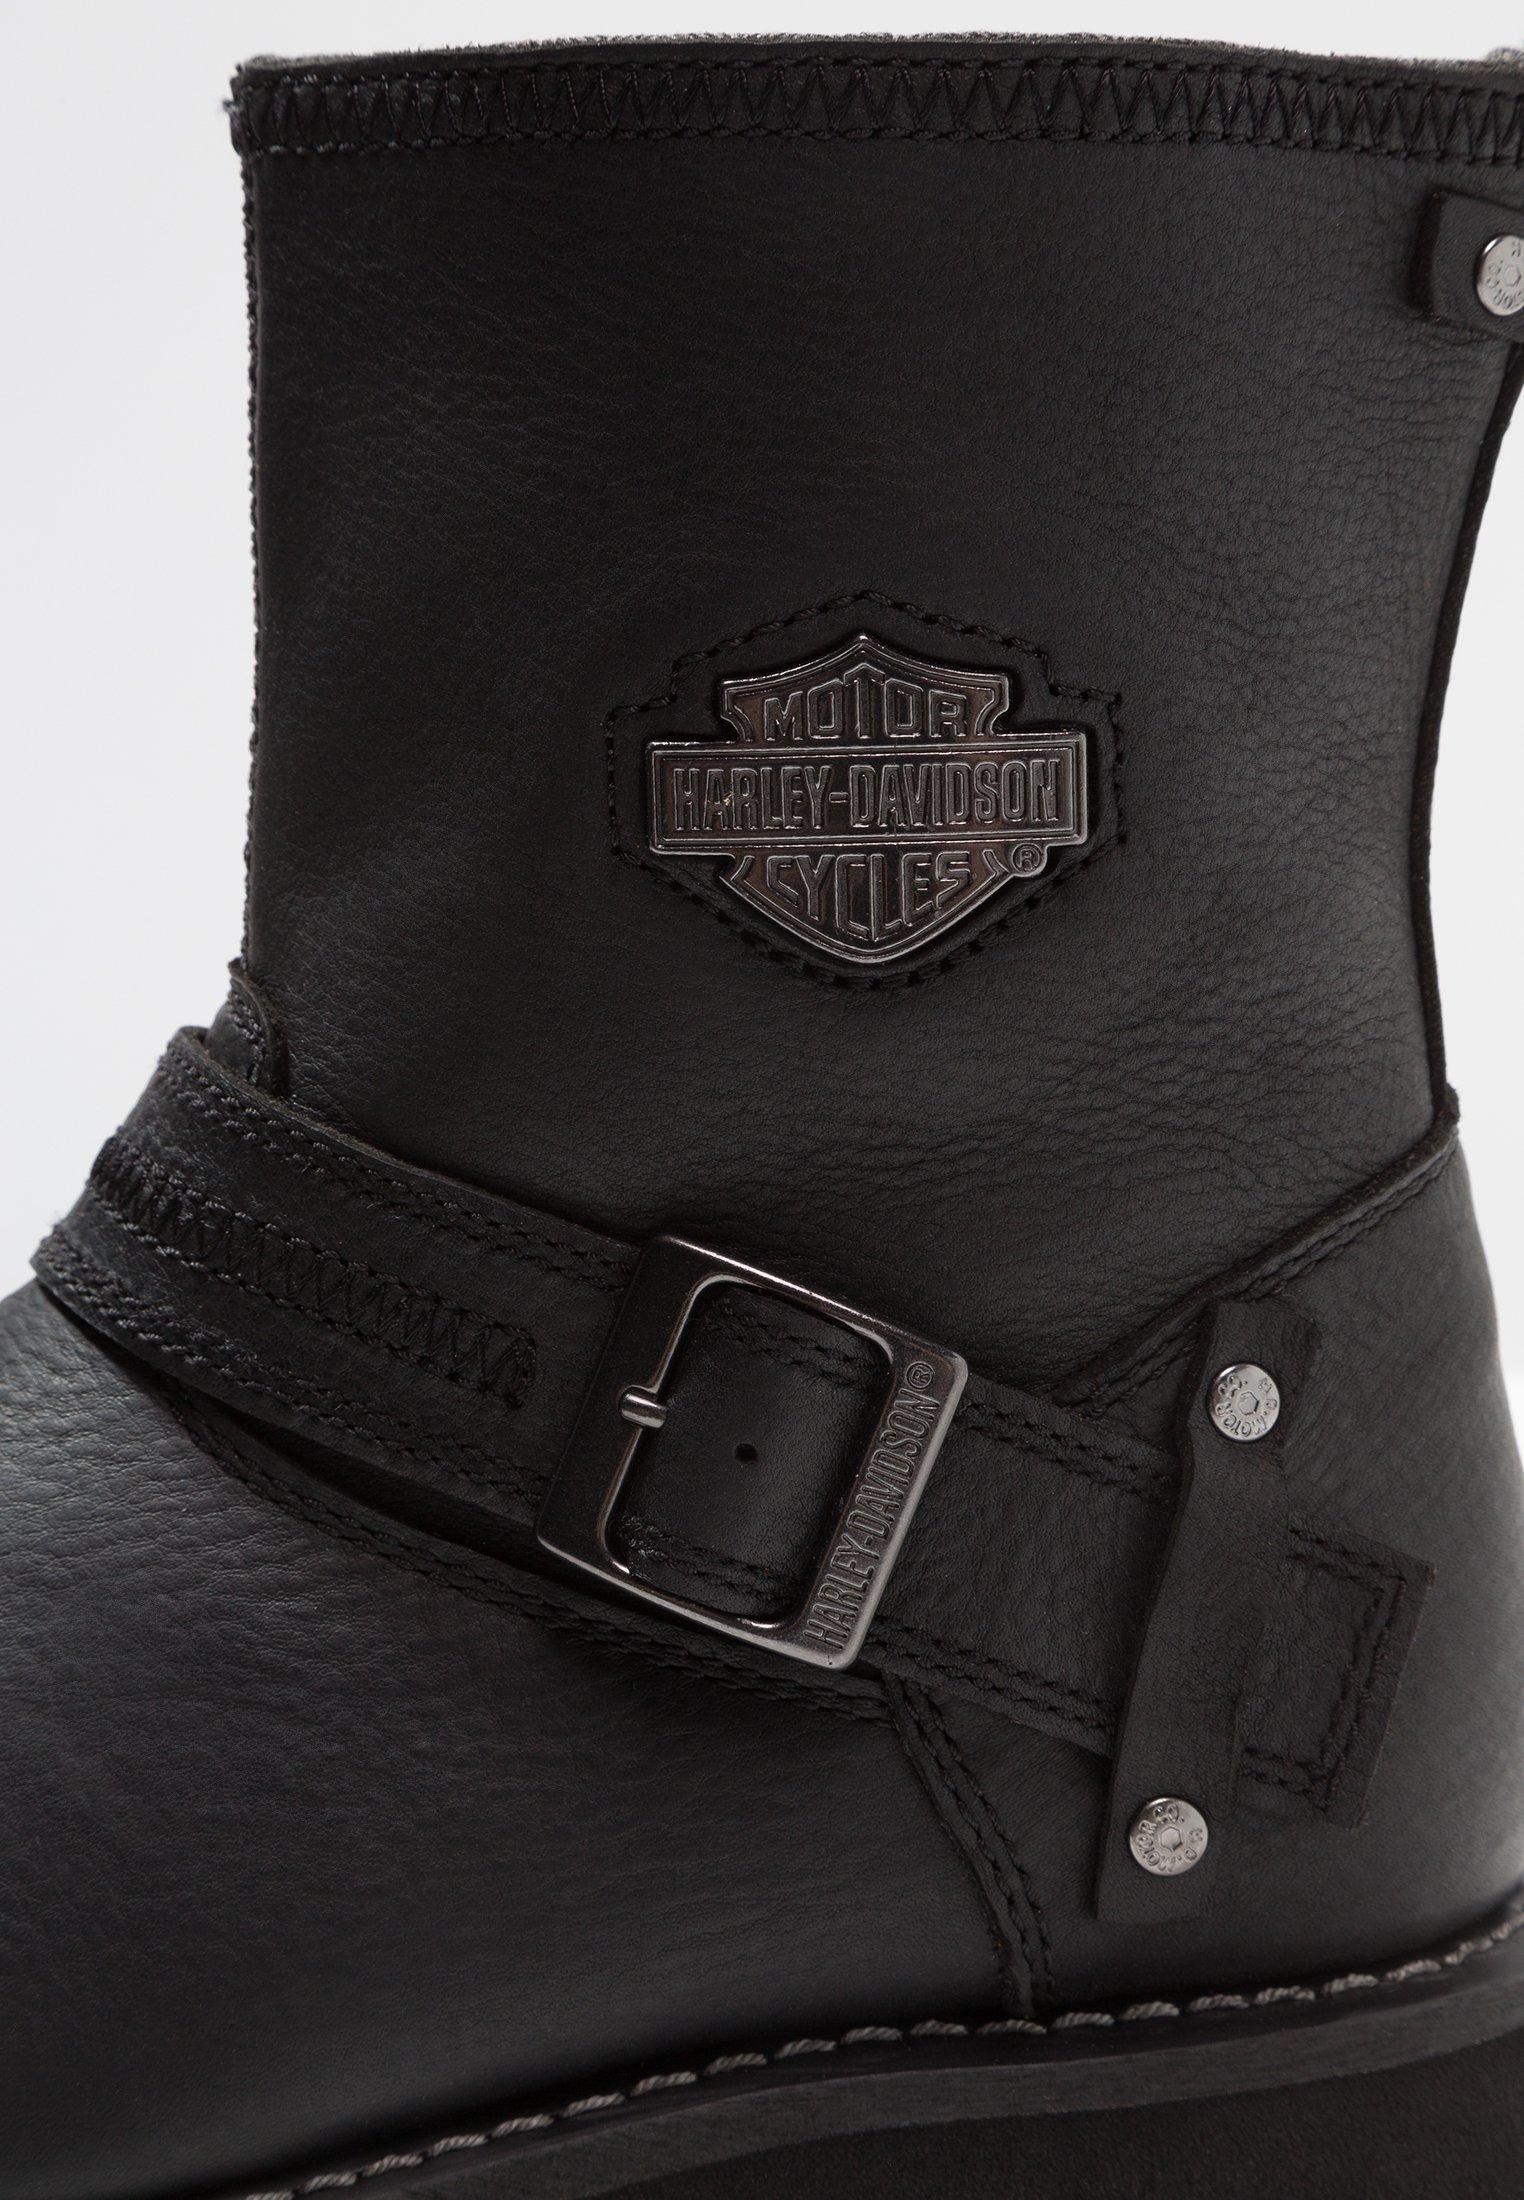 Harley Davidson Richton - Cowboy-/bikerlaarsjes Black Goedkope Schoenen